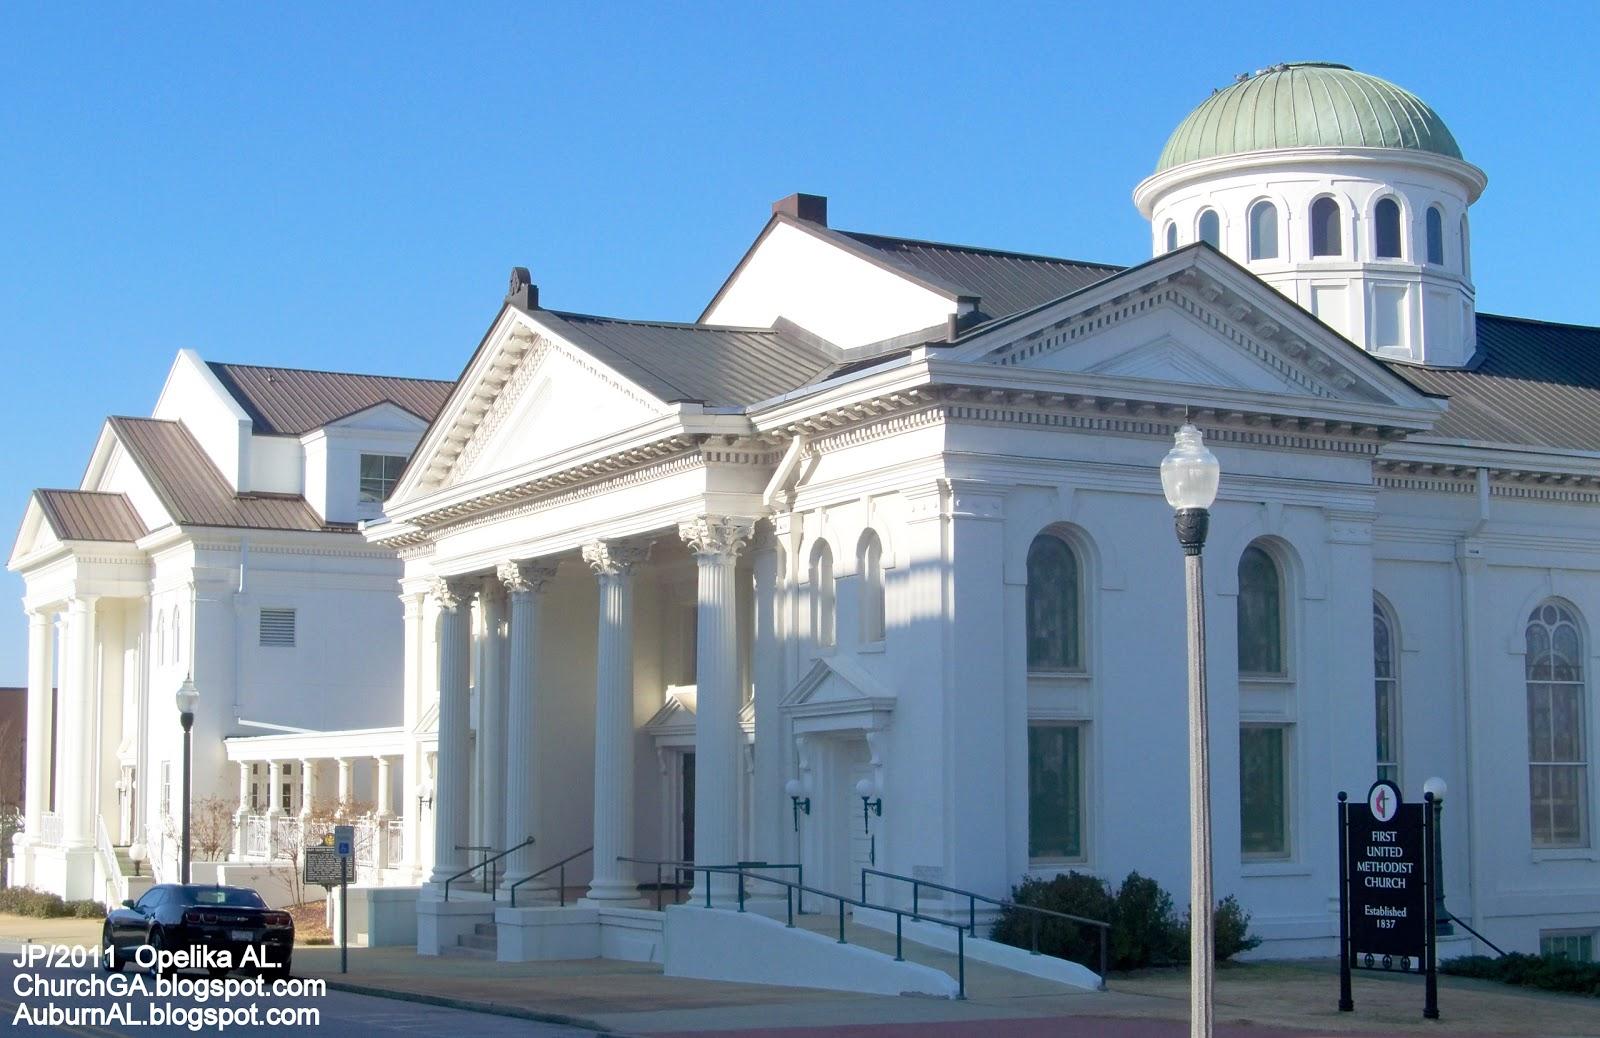 Alabama lee county salem - Methodist Church First United Opelika Alabama First United Methodist Church Lee County Opelika Al